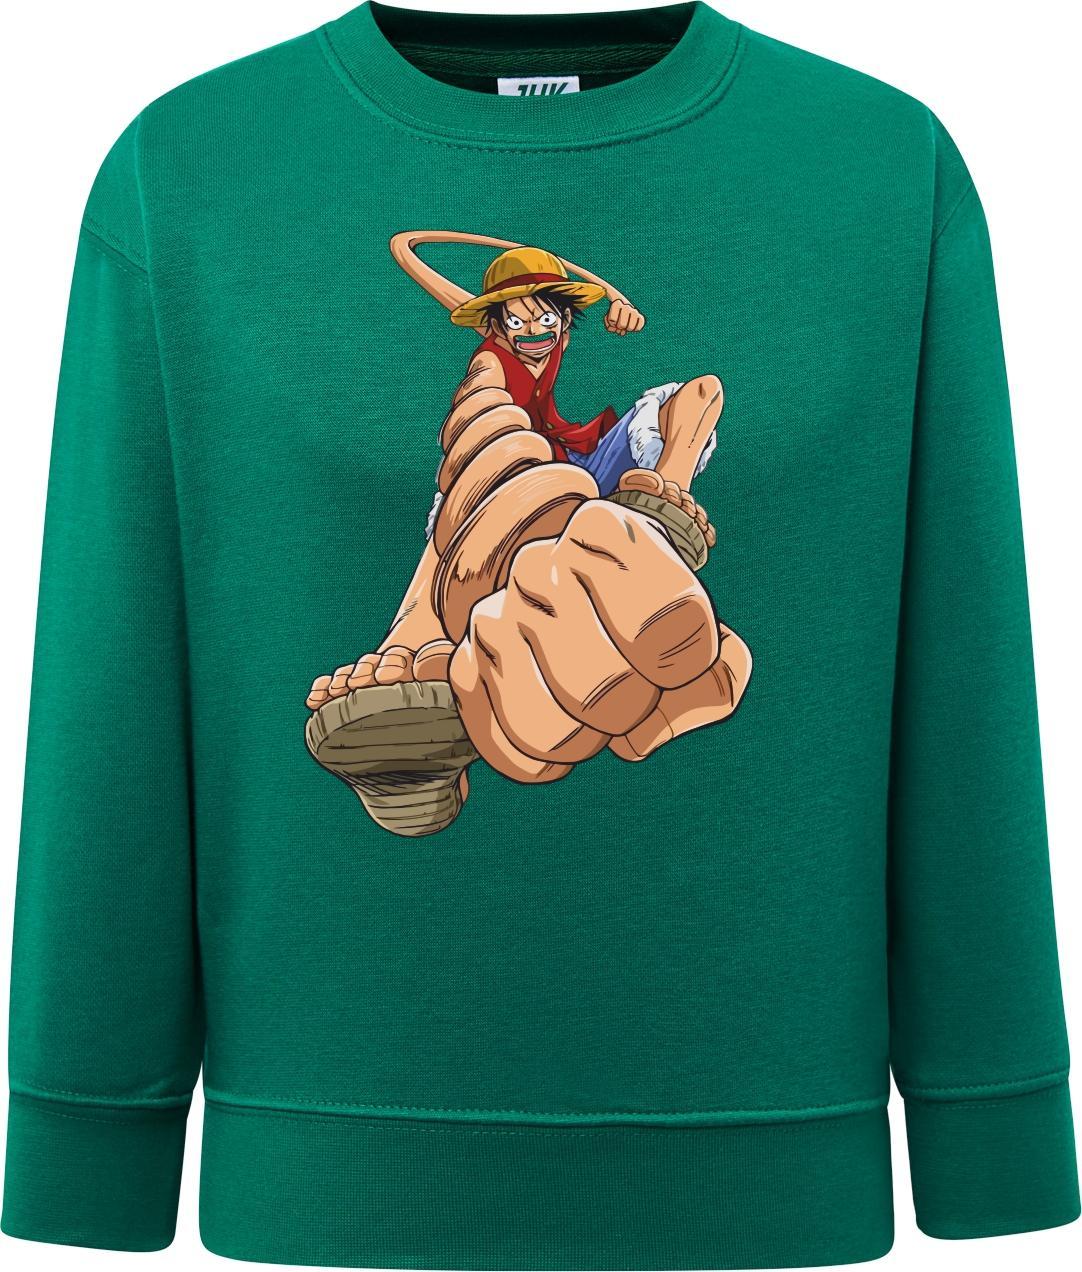 Sudadera Niño Luffy - One Piece